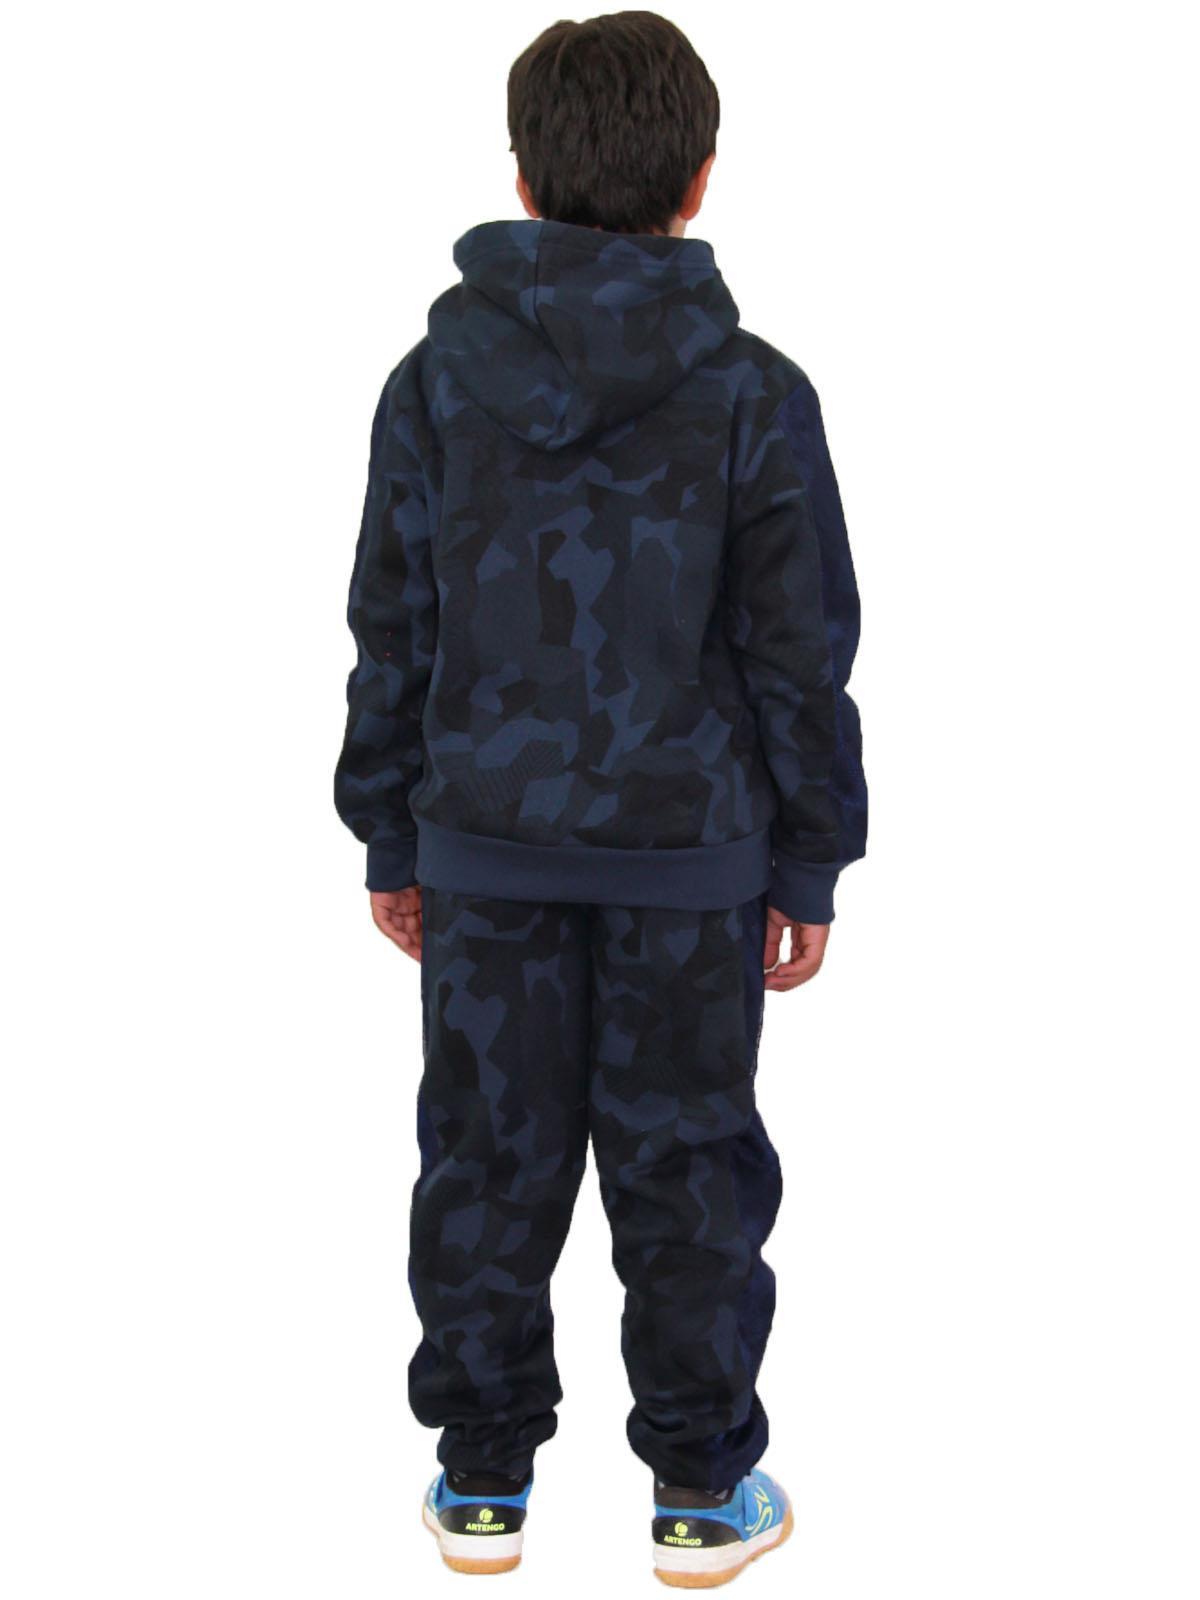 Enfants Garçons Survêtement Navy Designer/'s #Selfie Camouflage Jogging Costume 5-13 Ans